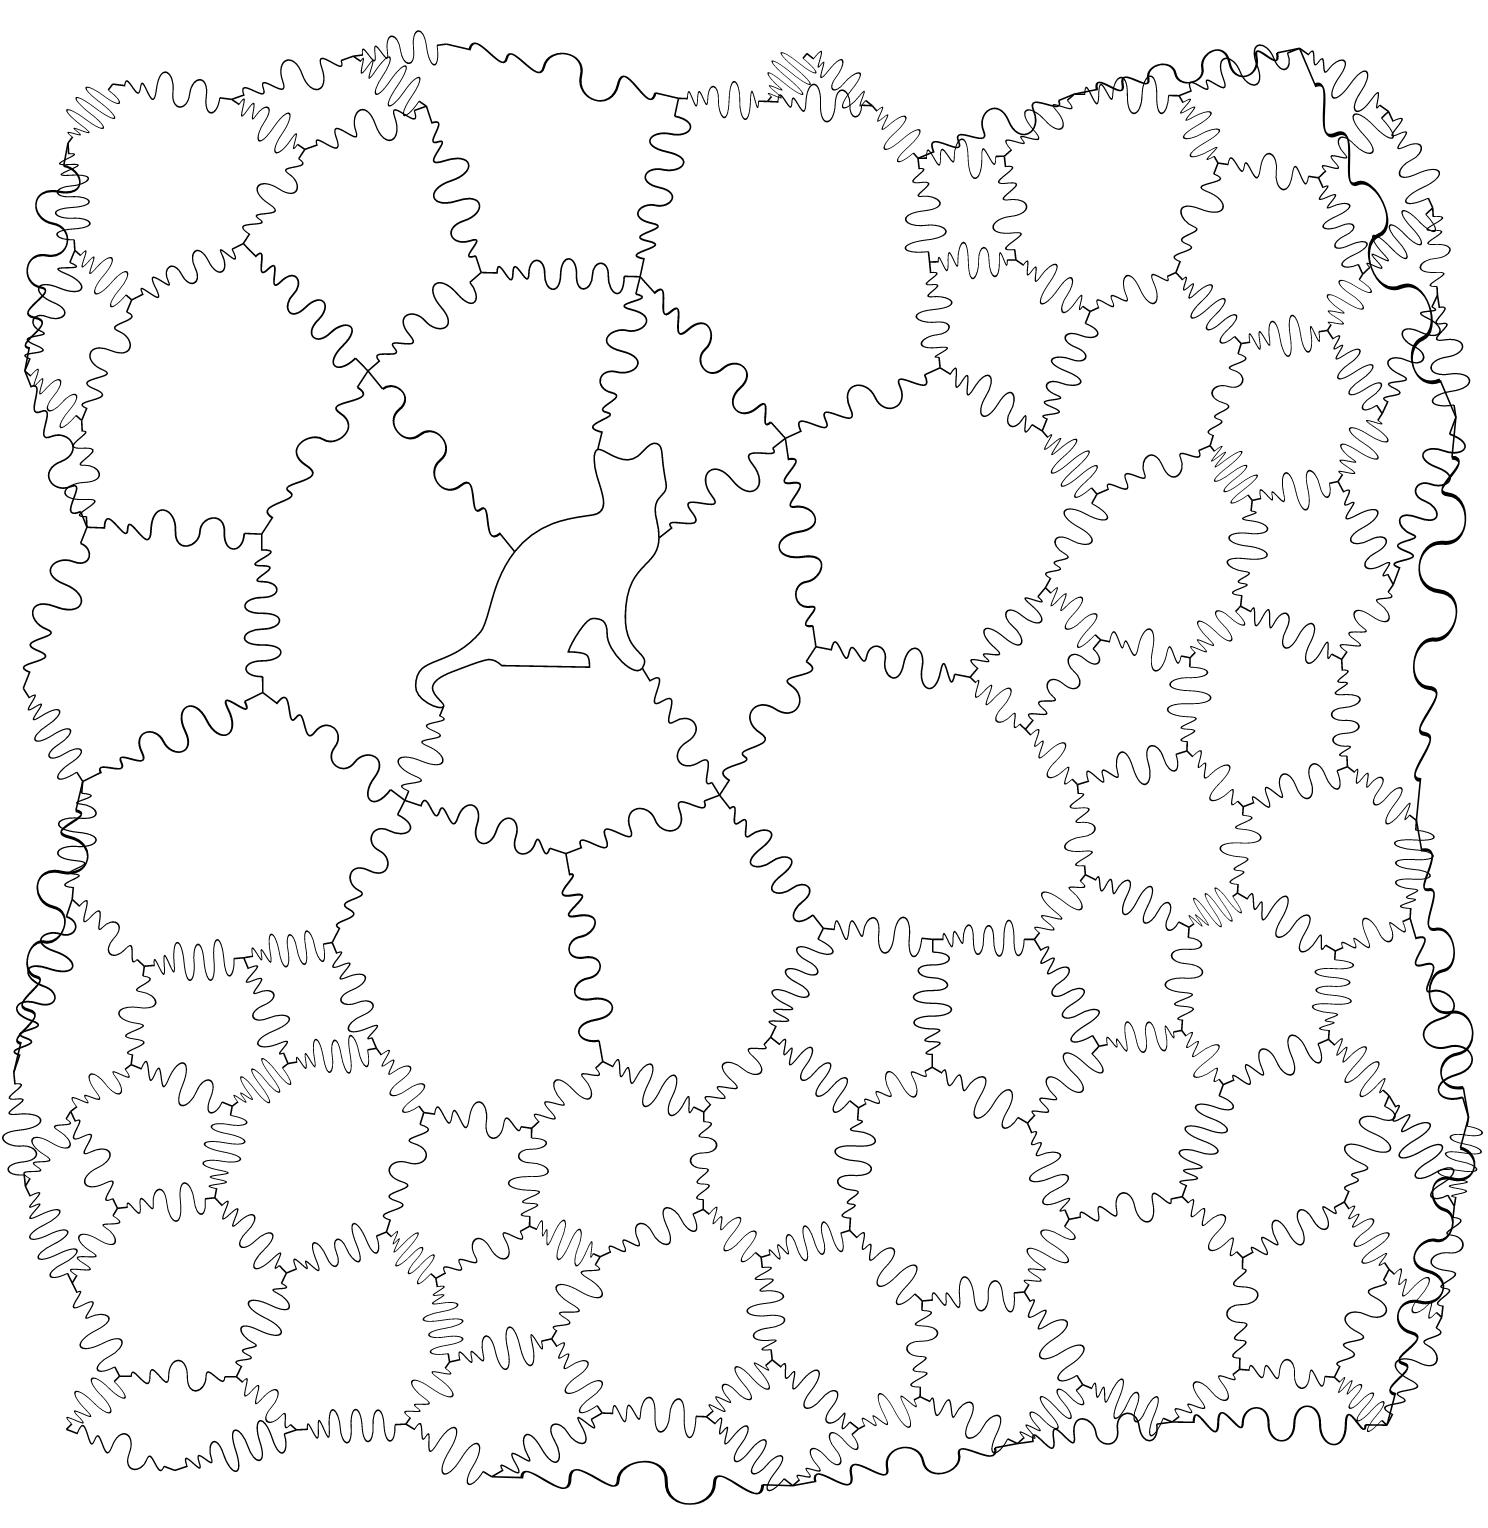 SVG Jigsaw Generation in Clojure